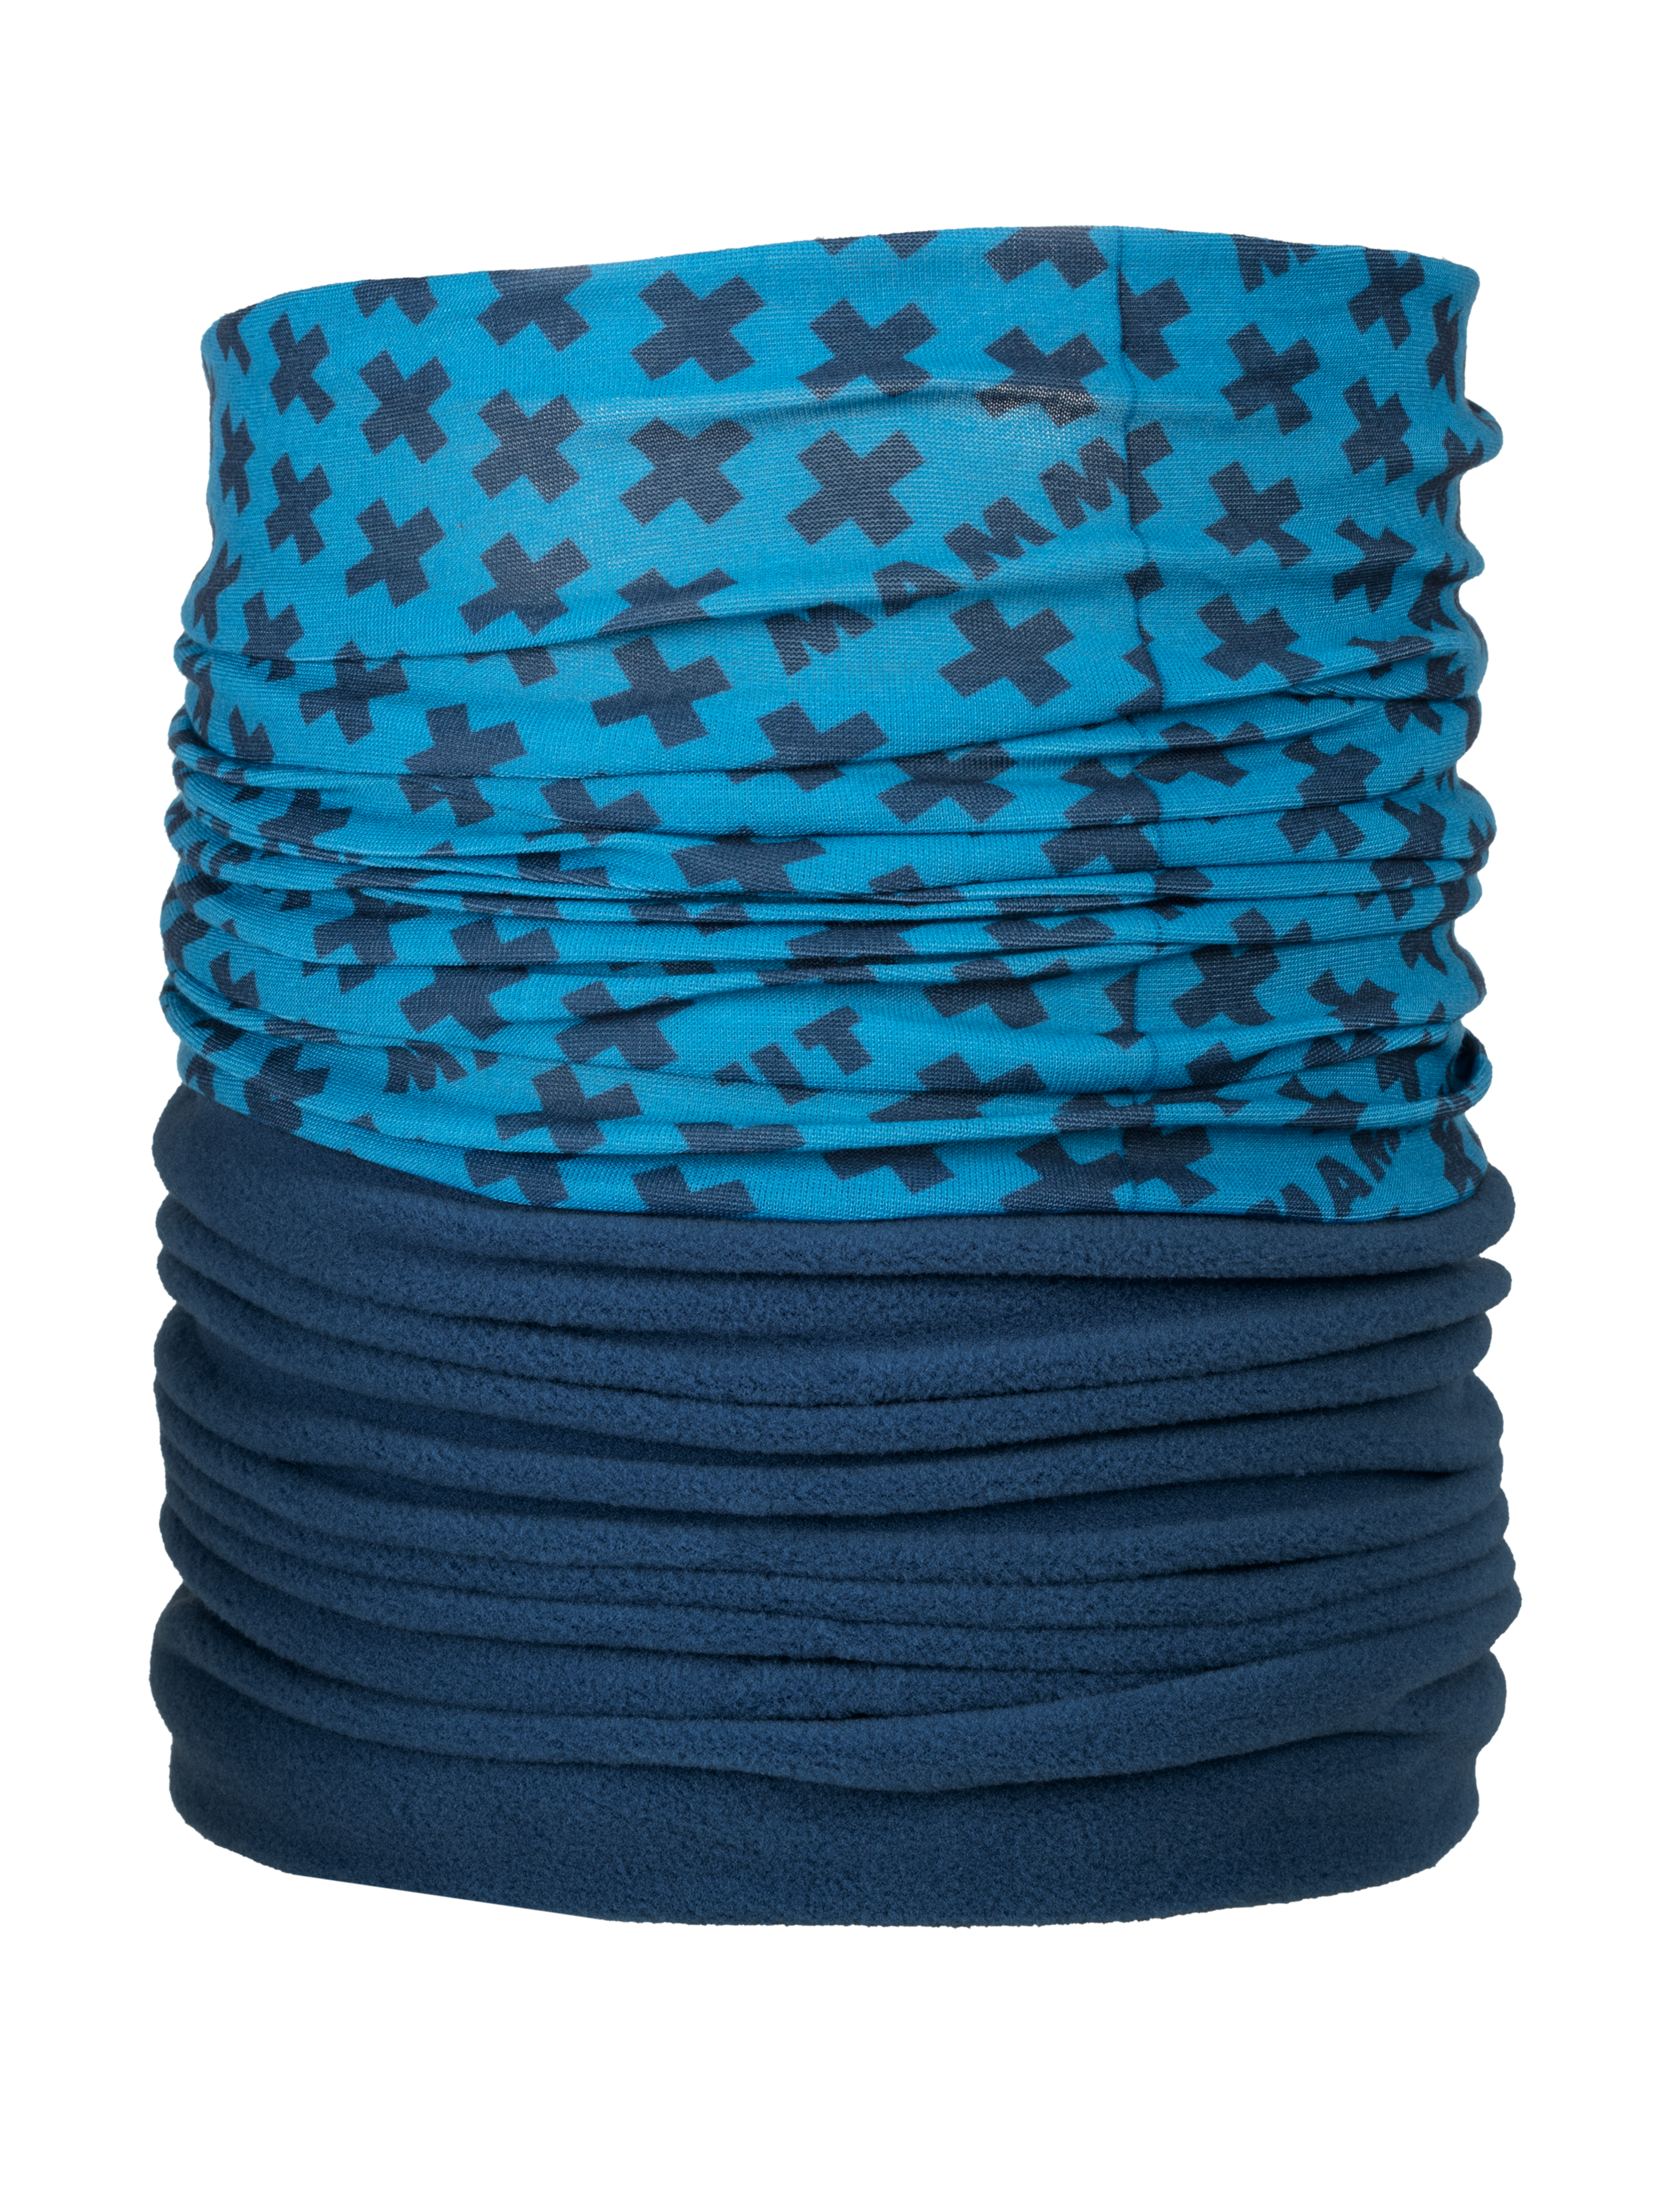 Mammut Thermo Neck Gaiter product image